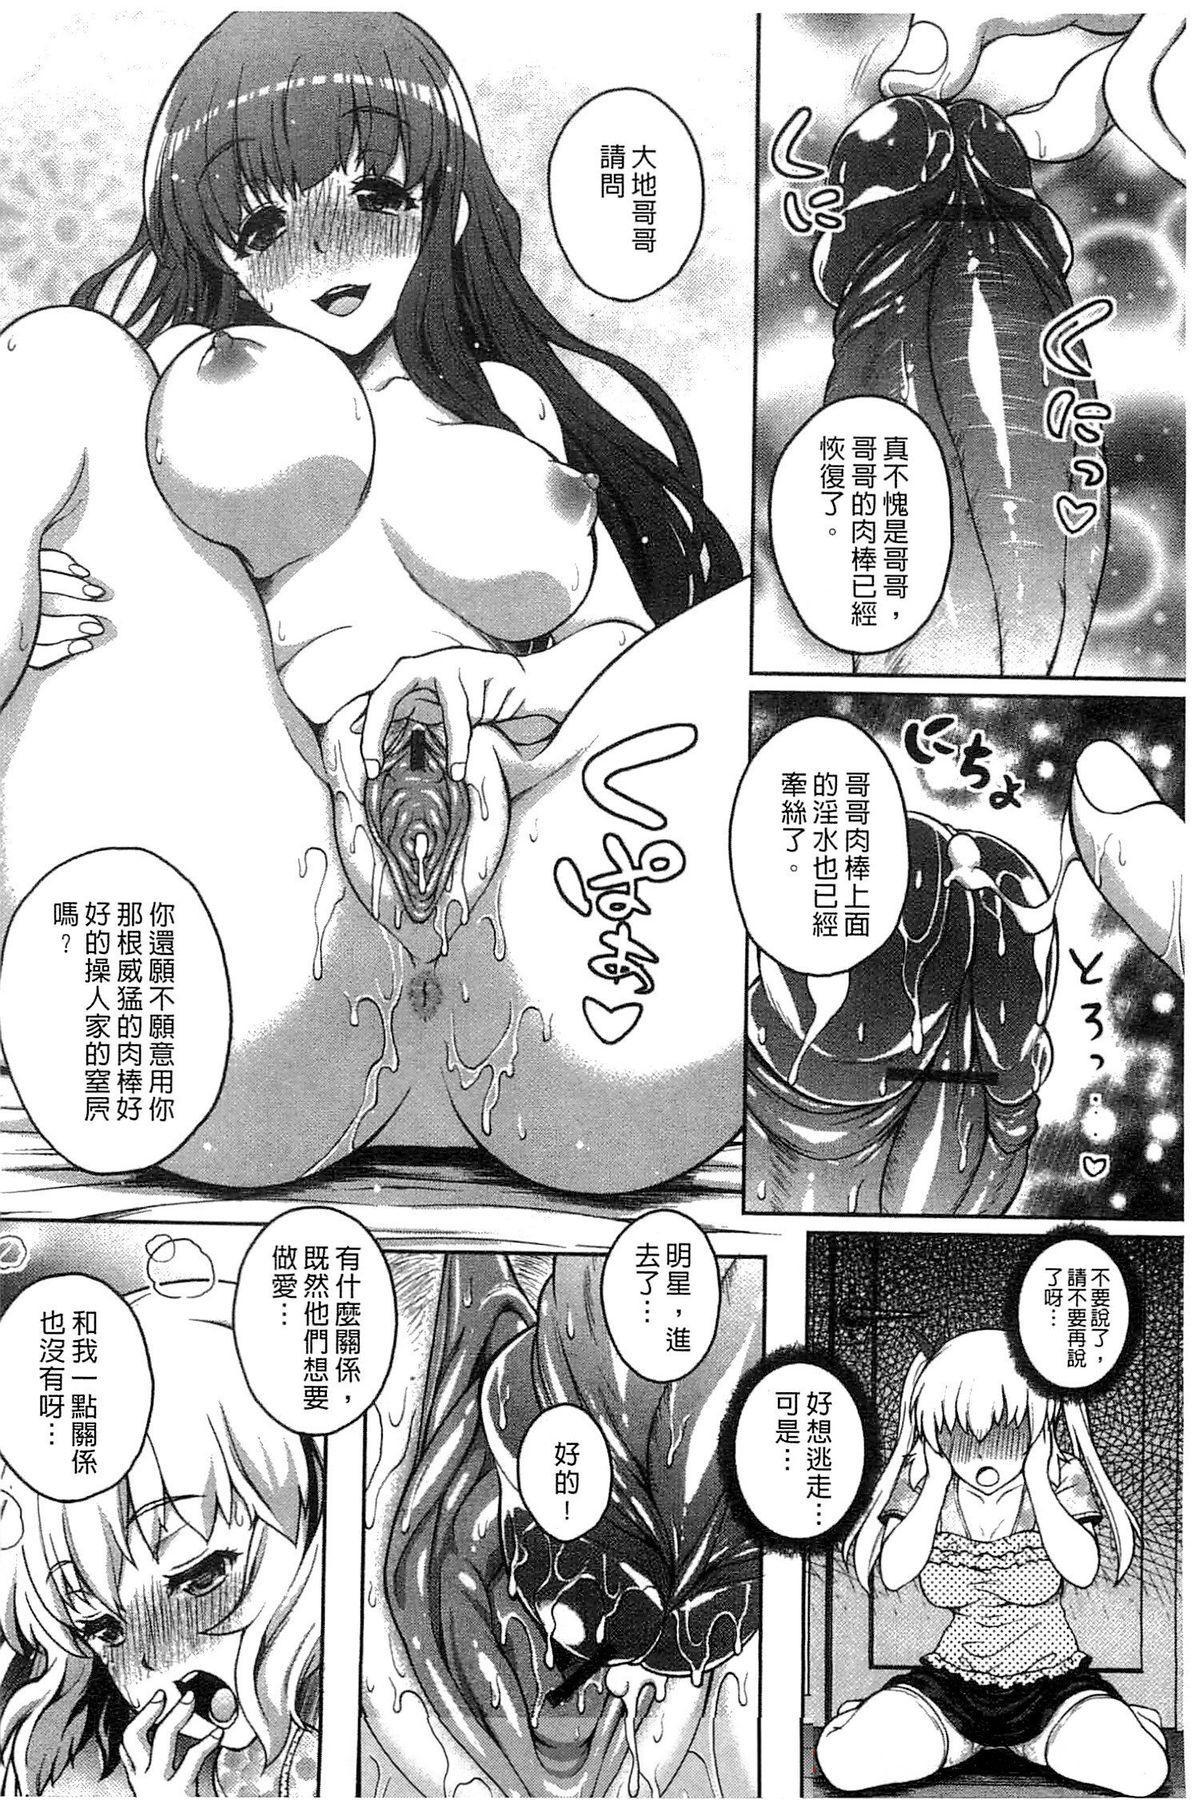 Hajimete nan dakara - First sexual experience 144